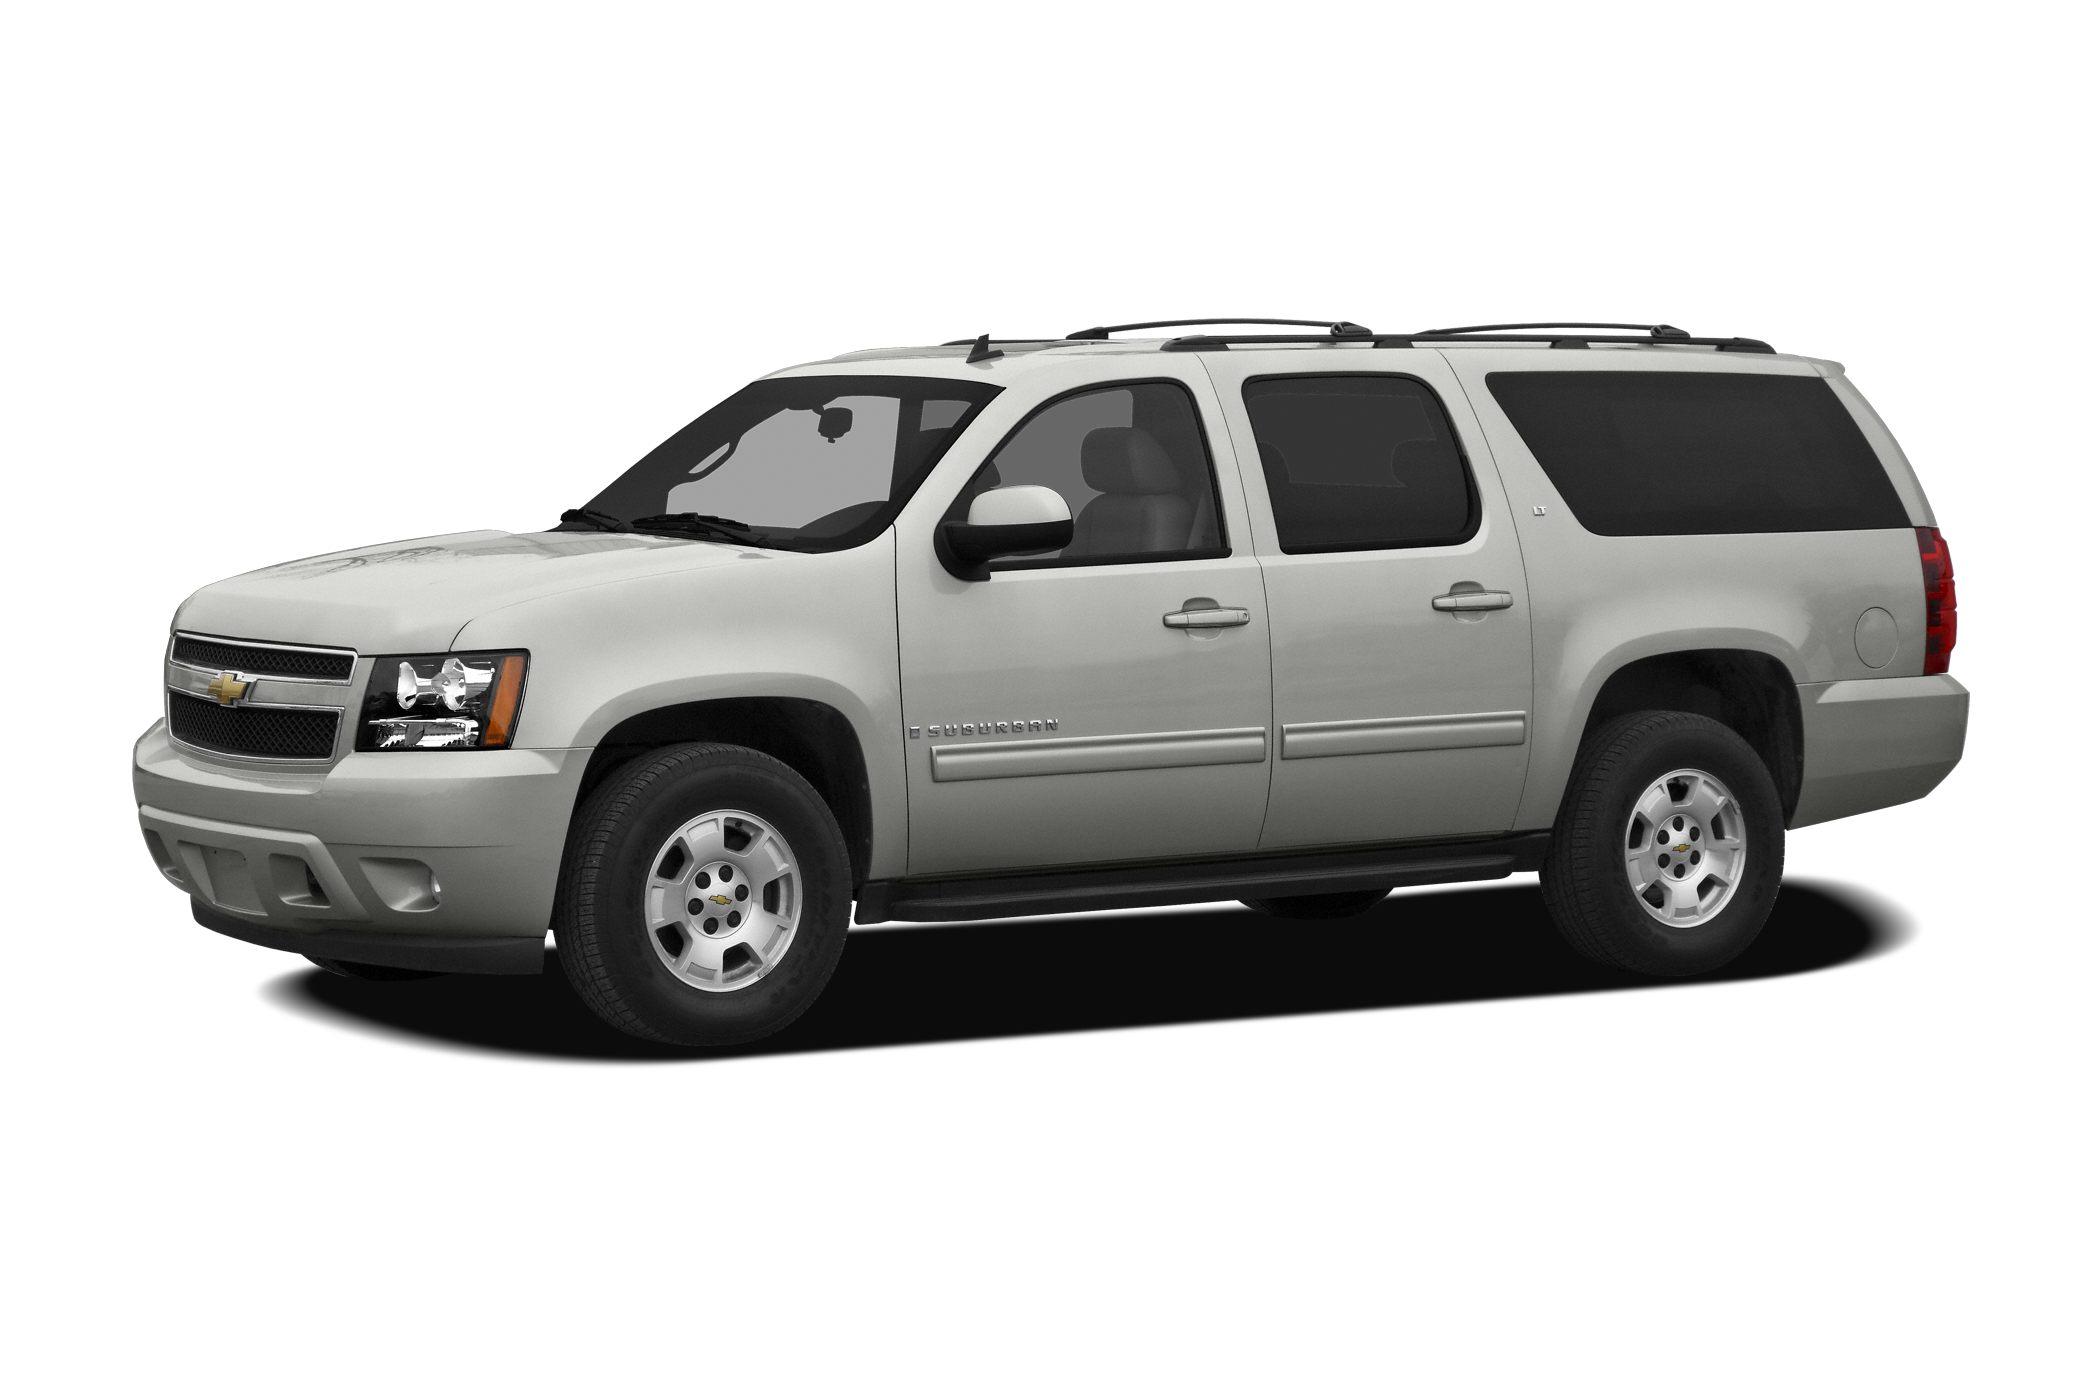 2009 Chevrolet Suburban 1500